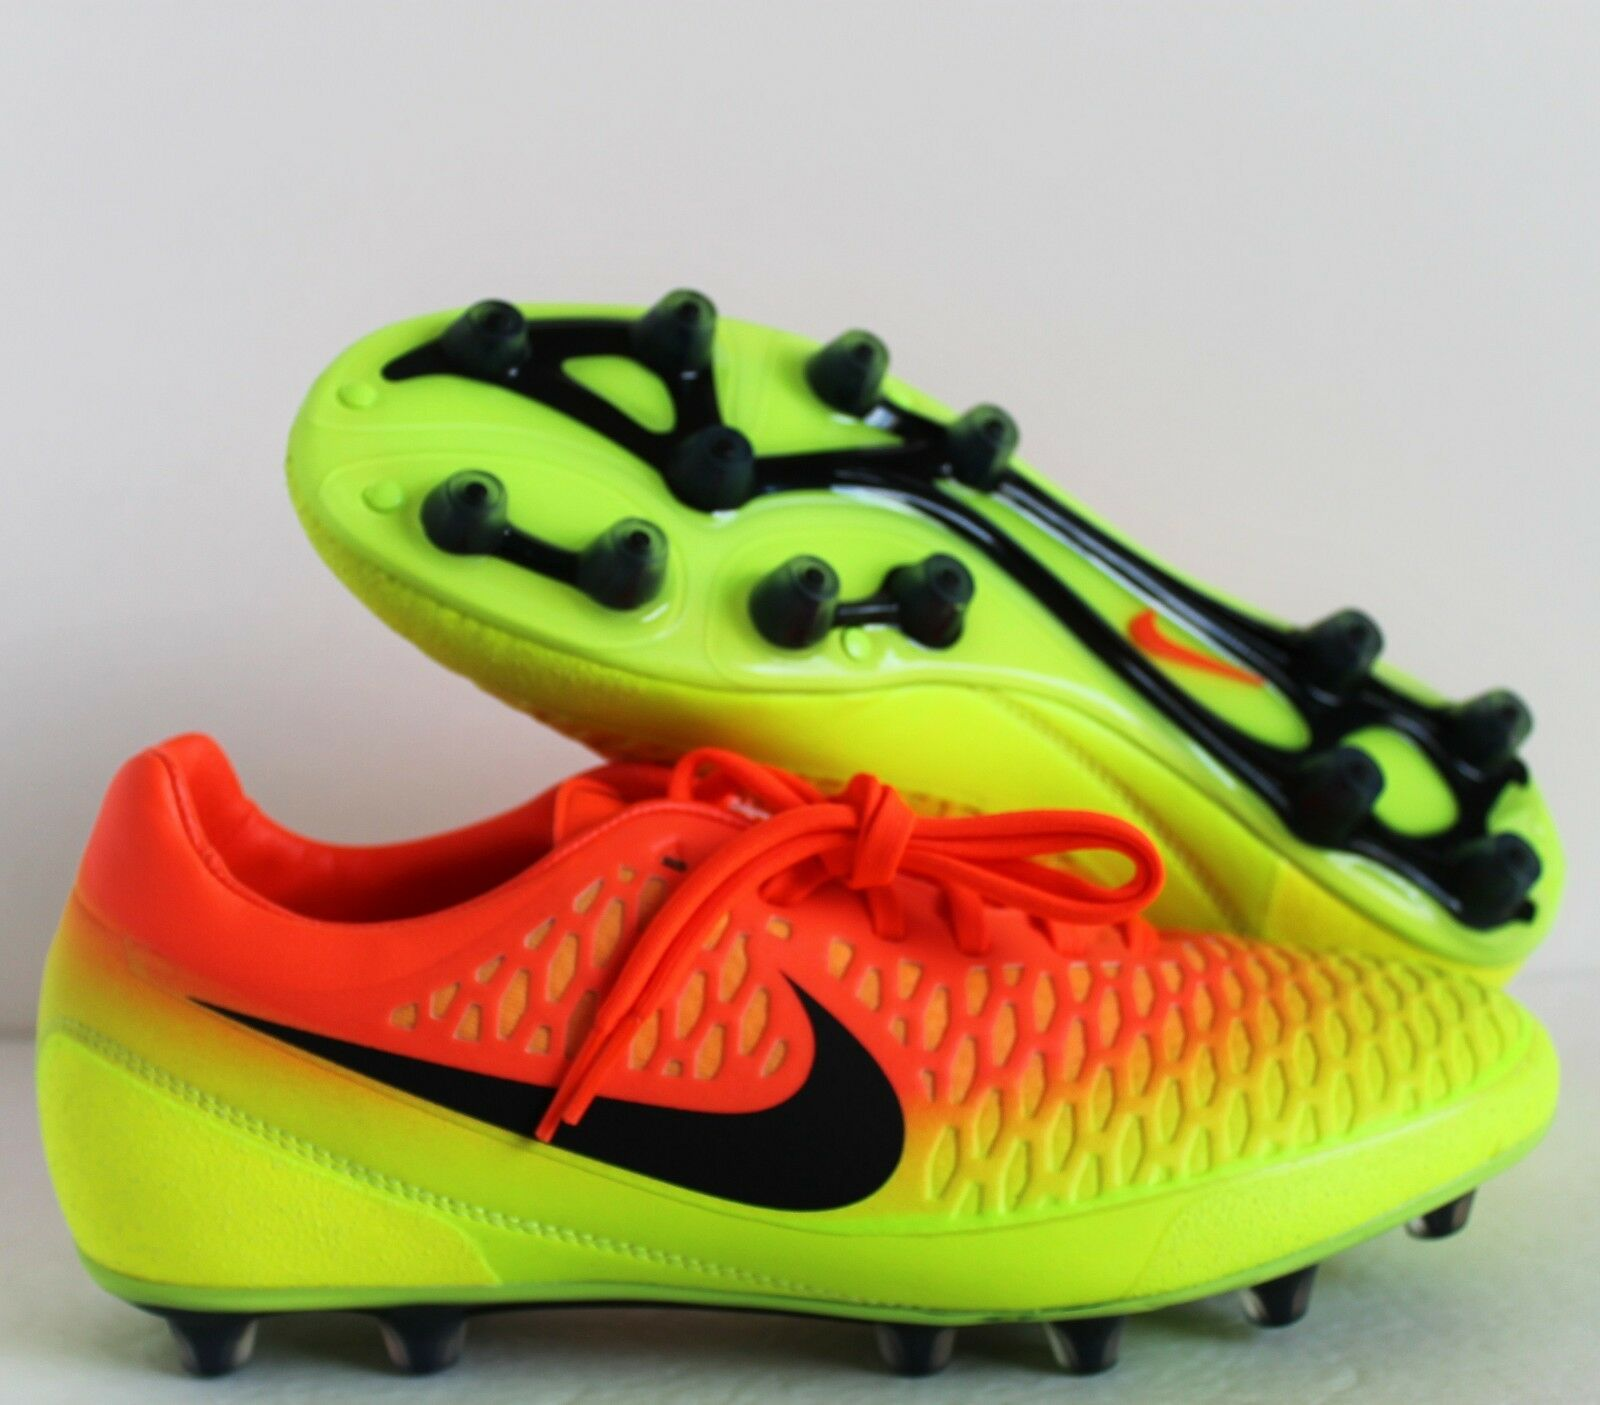 "0b4e39429 Nike Nike Nike Magista Opus HGe voltios Botines De FútbolNaranjaNegro  [649231807] 17b109. """